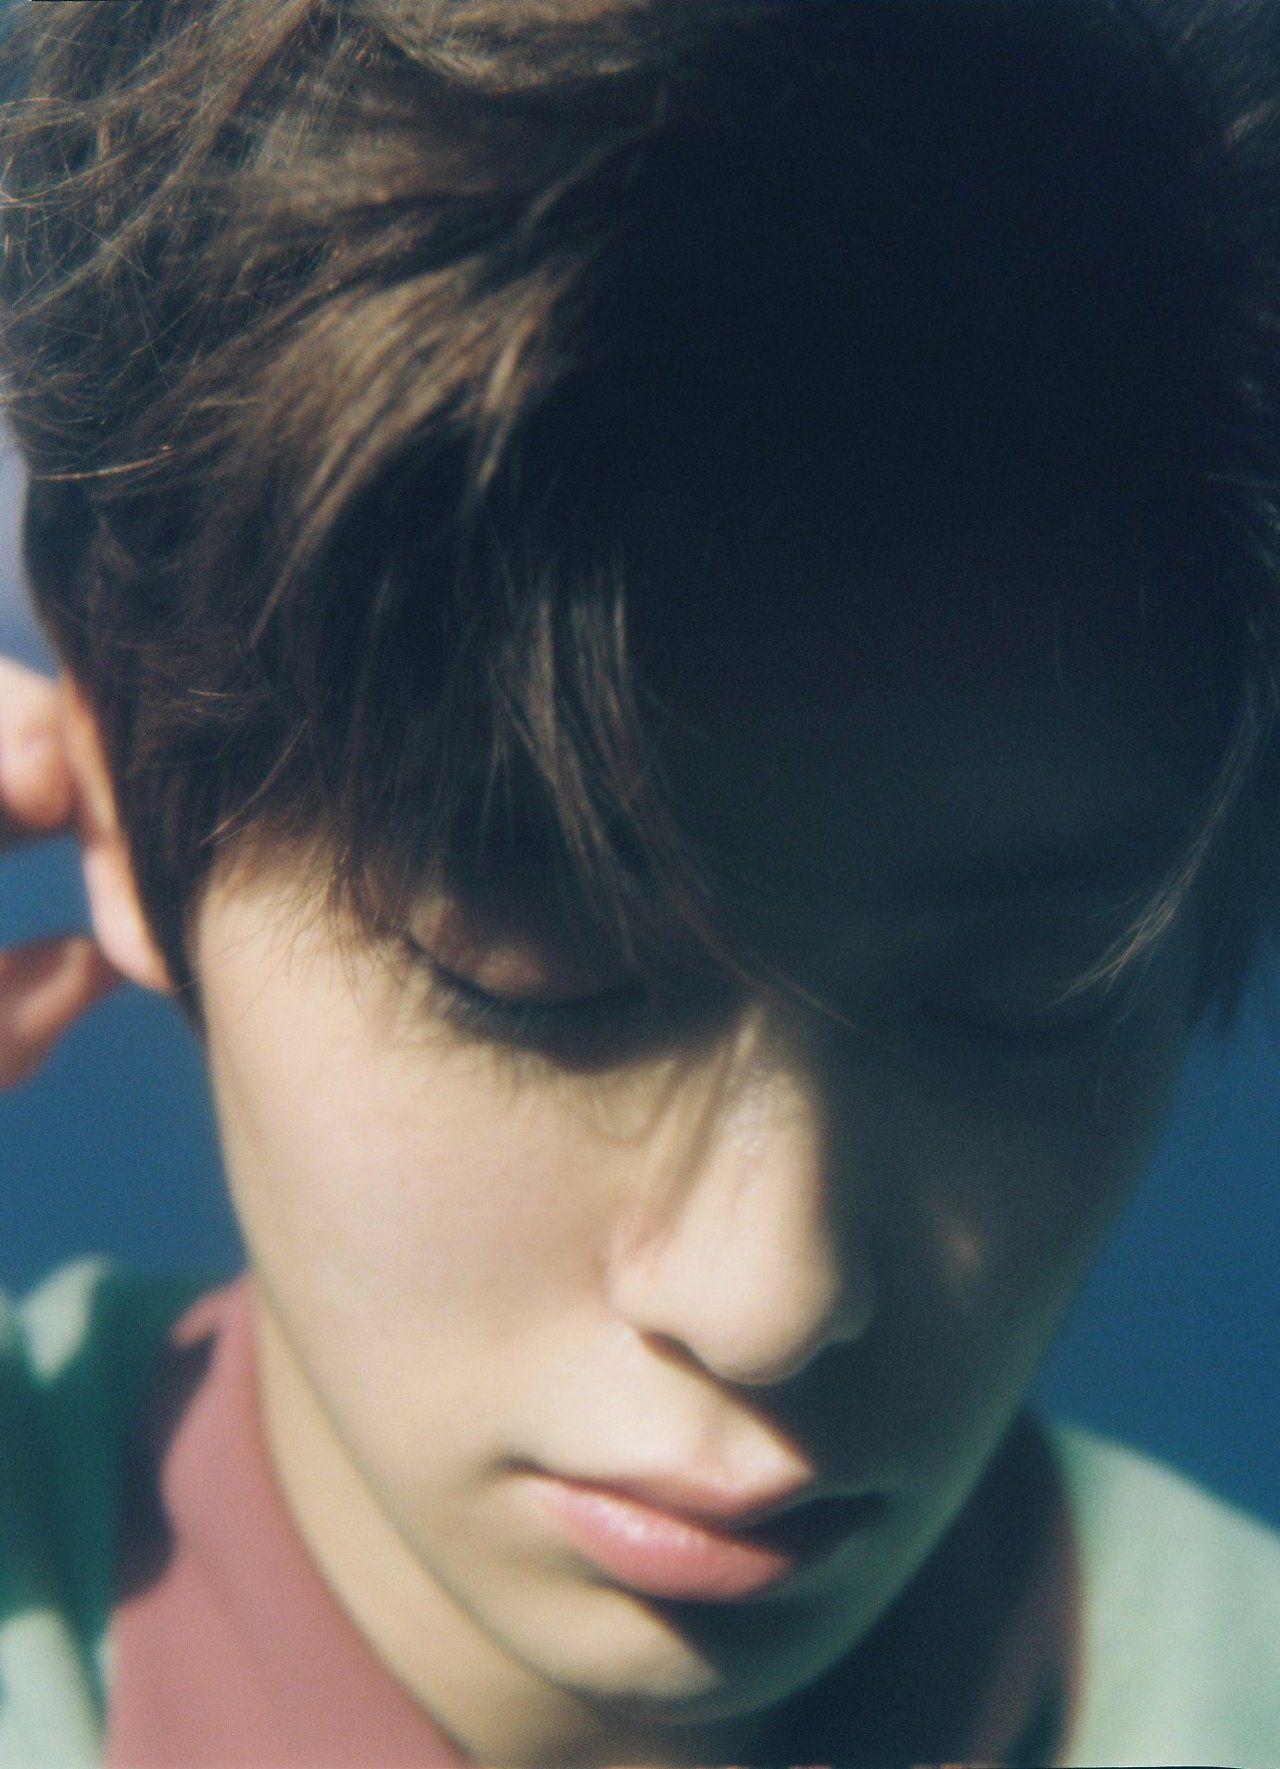 [STATION] d.ear x Jaehyun 'Try Again' MV